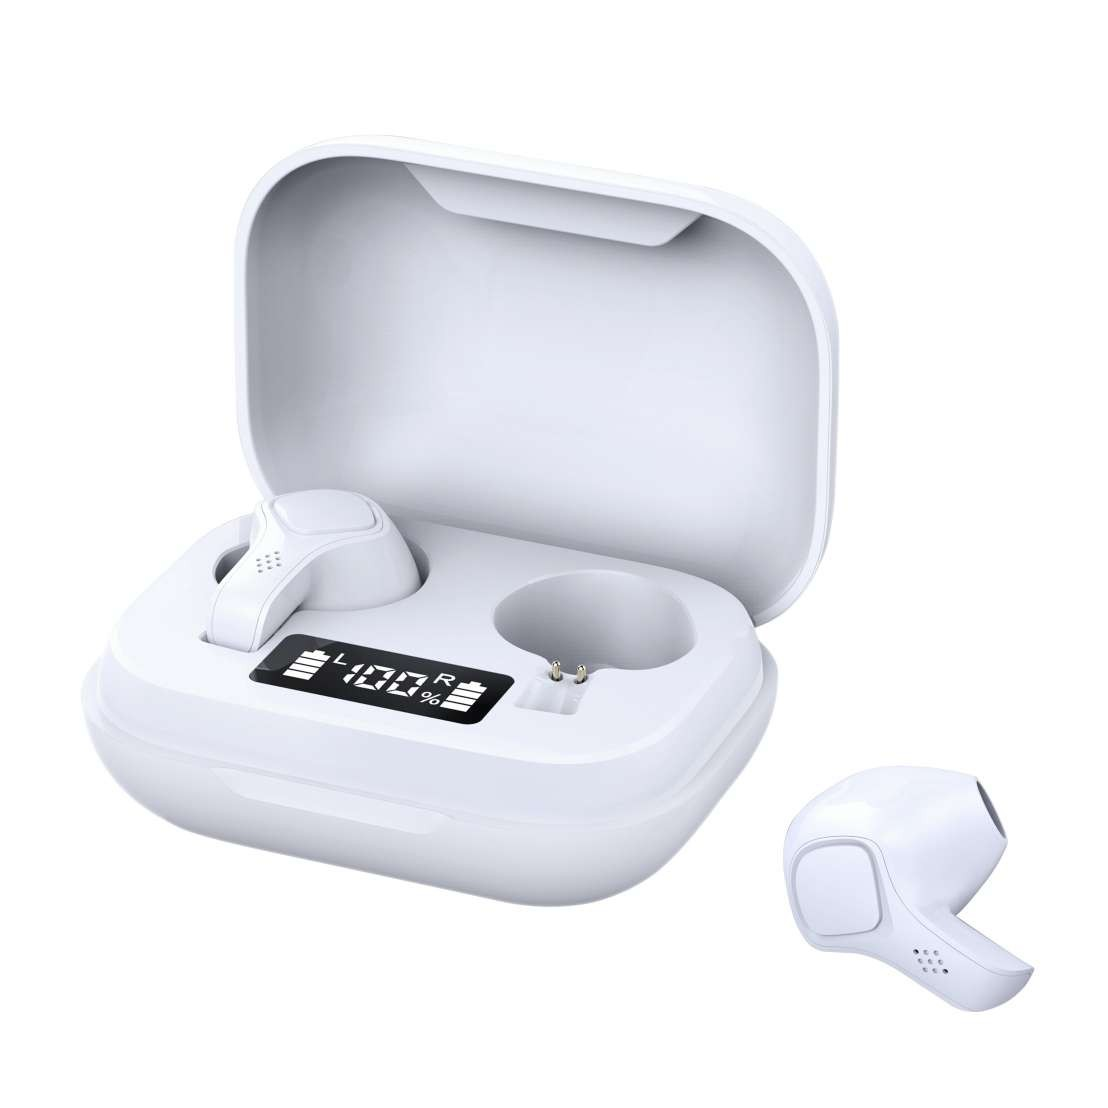 Casti Smart Techstar® TWS S20 , Wireless, Bluetooth V5.0, HD Audio, Touch, IPX5, iOS, Android, 300mAh, Type-C, Alb imagine techstar.ro 2021